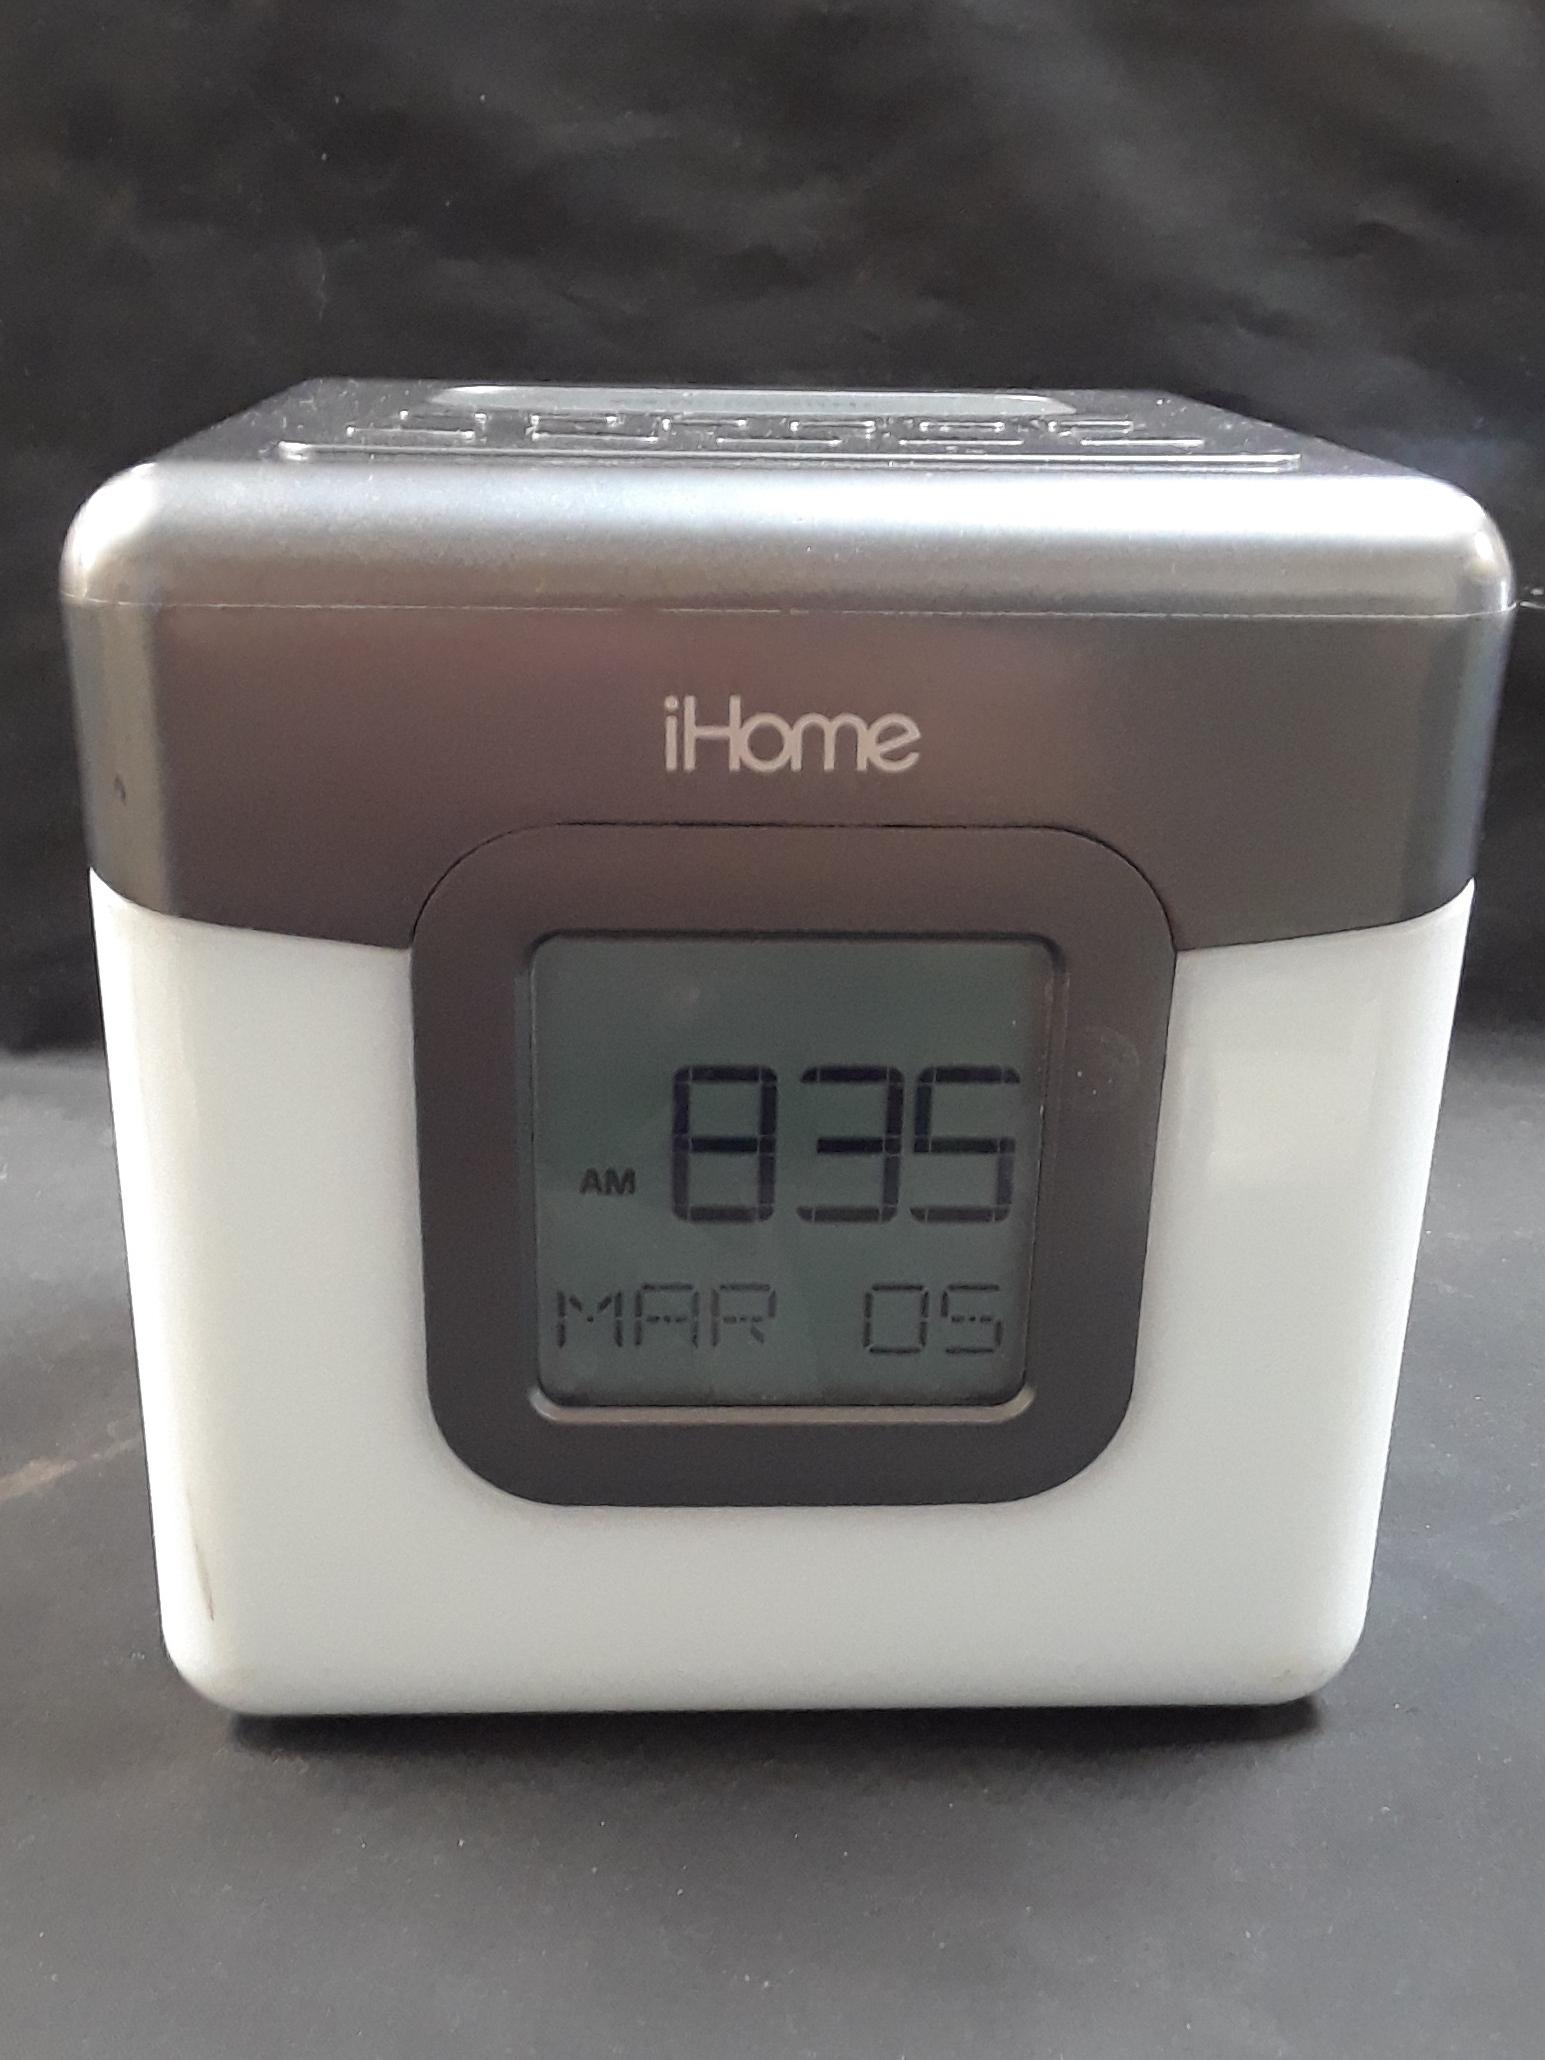 ELECTRONICS: IHOME SPEAKER - IBT28